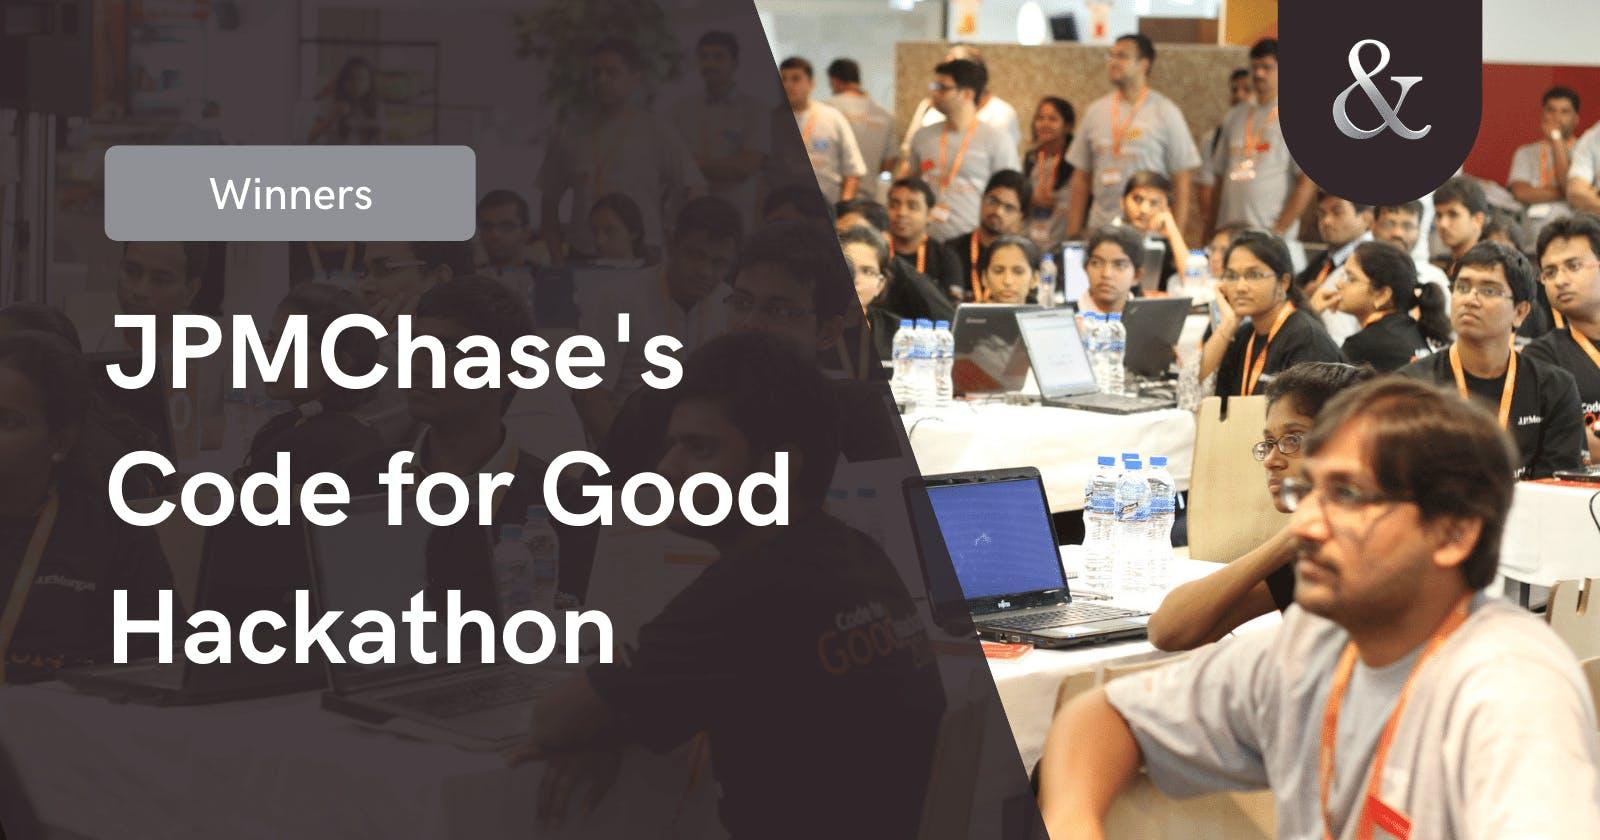 My Winning Experience in JPMorgan Chase's CodeforGood 2020